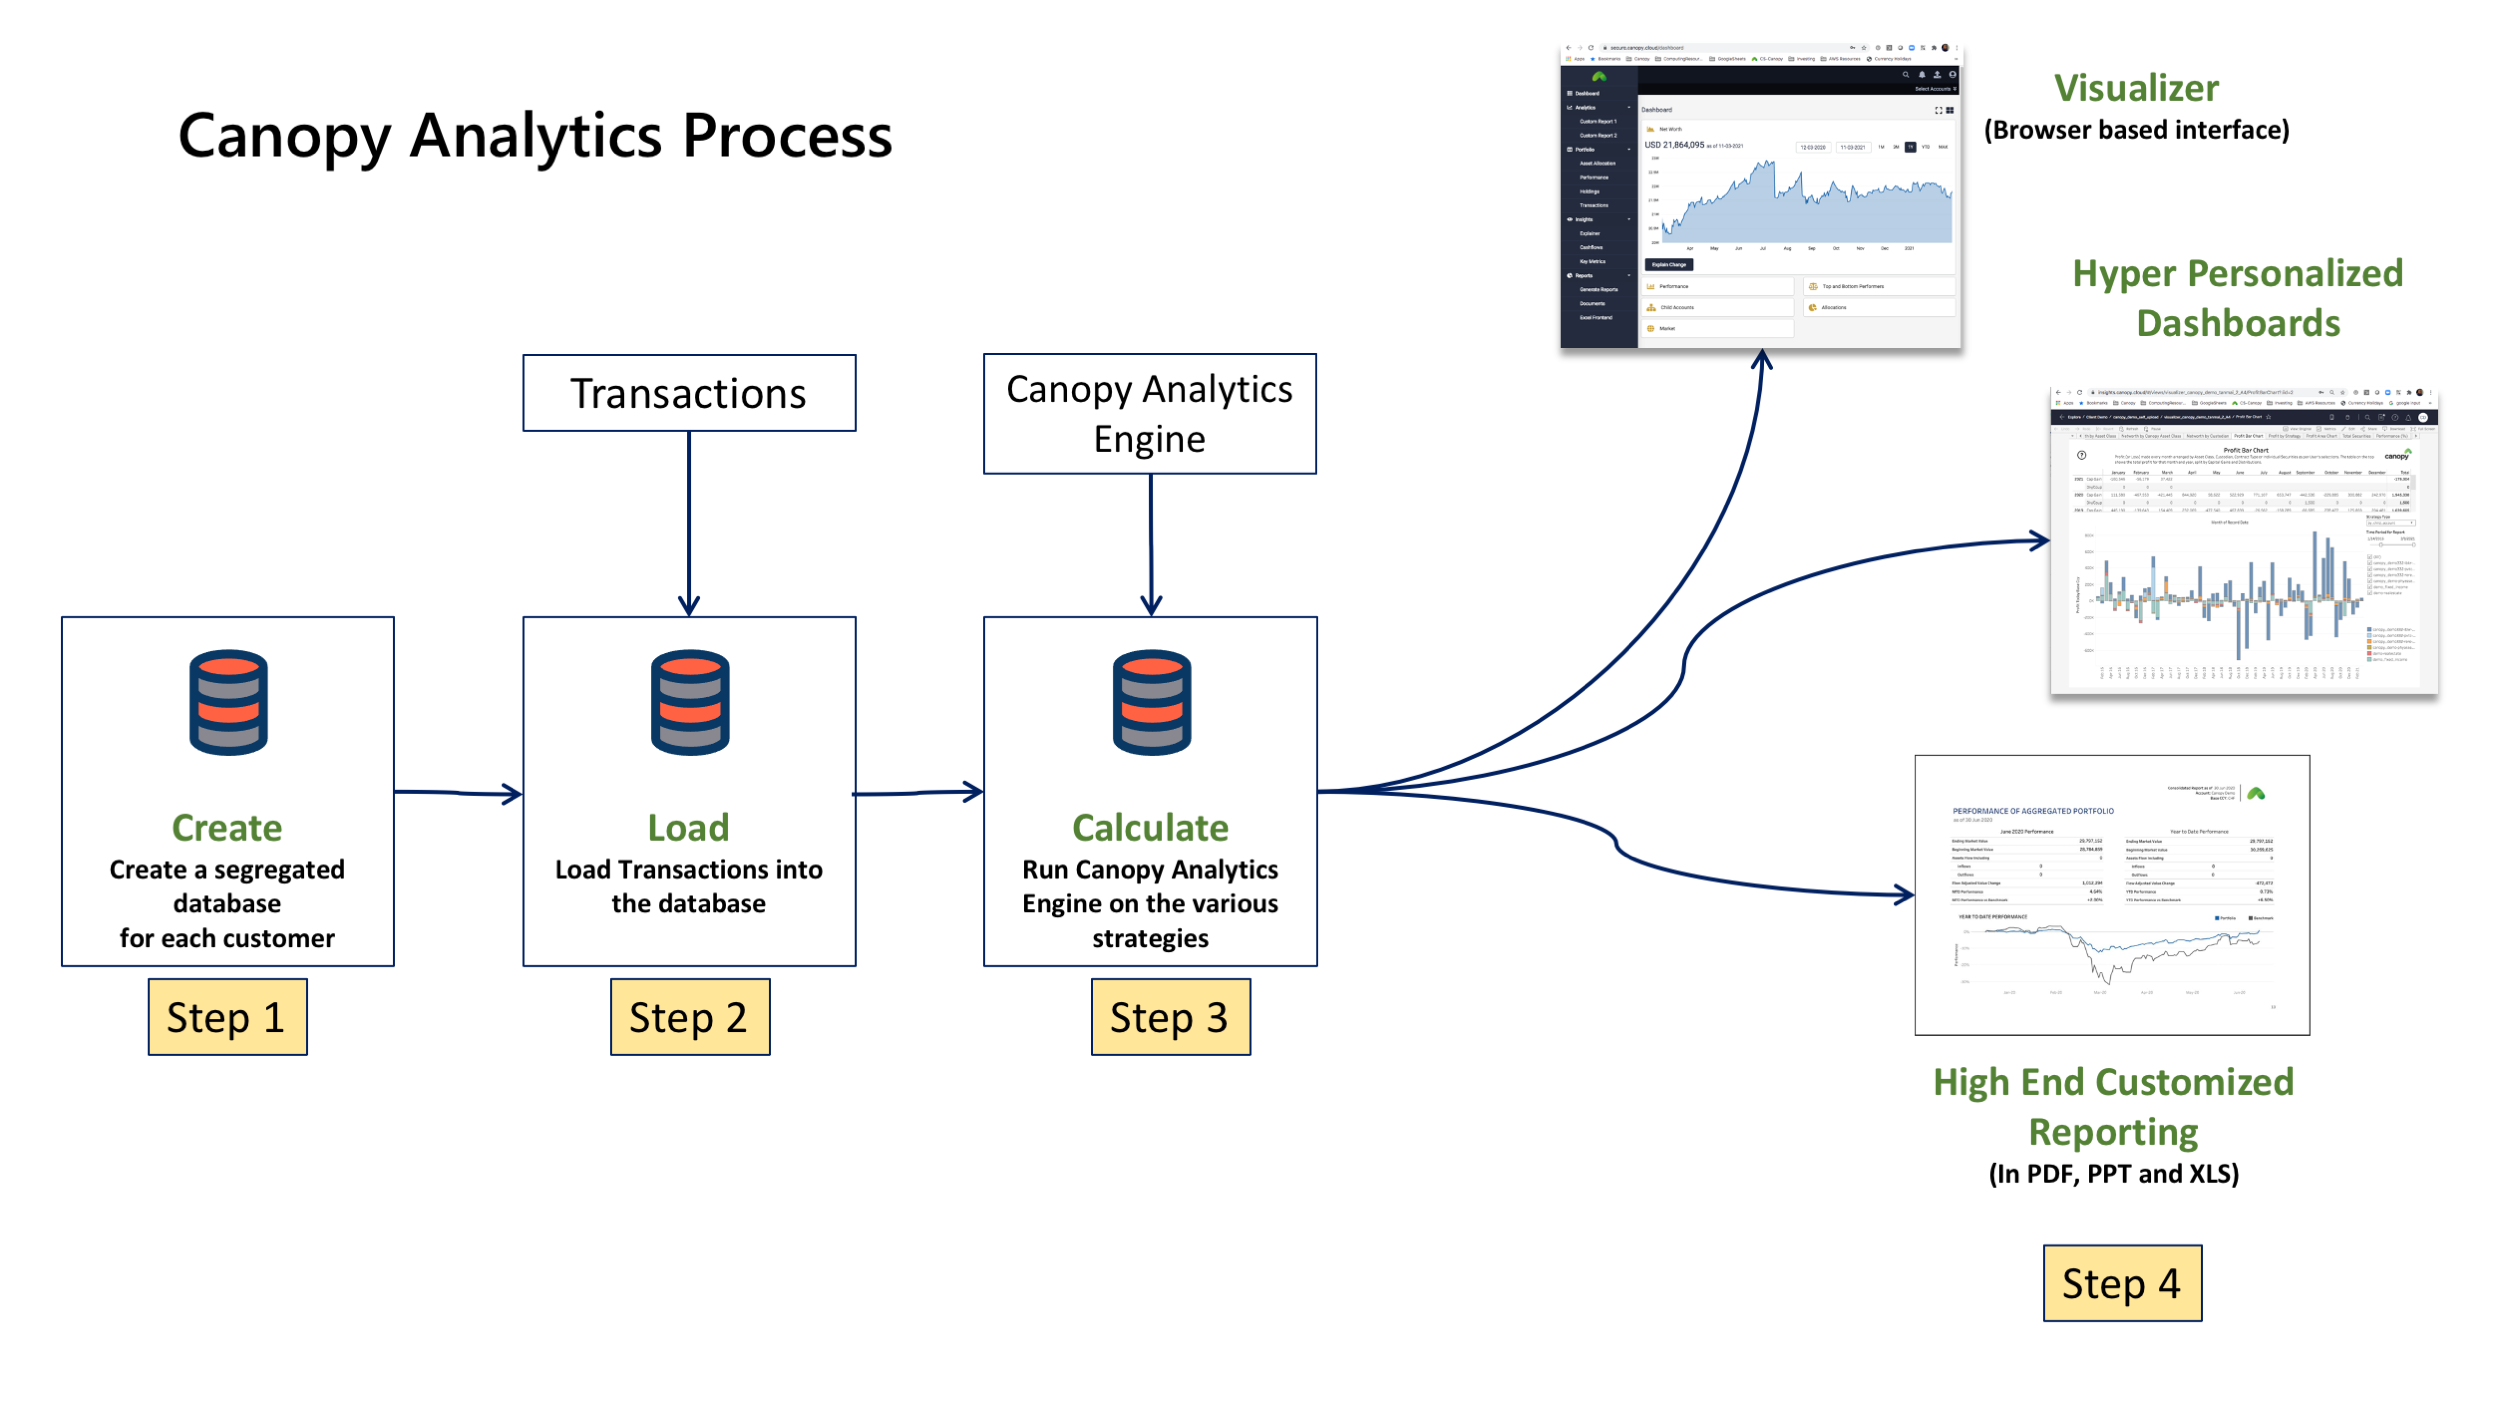 Canopy Analytics Process